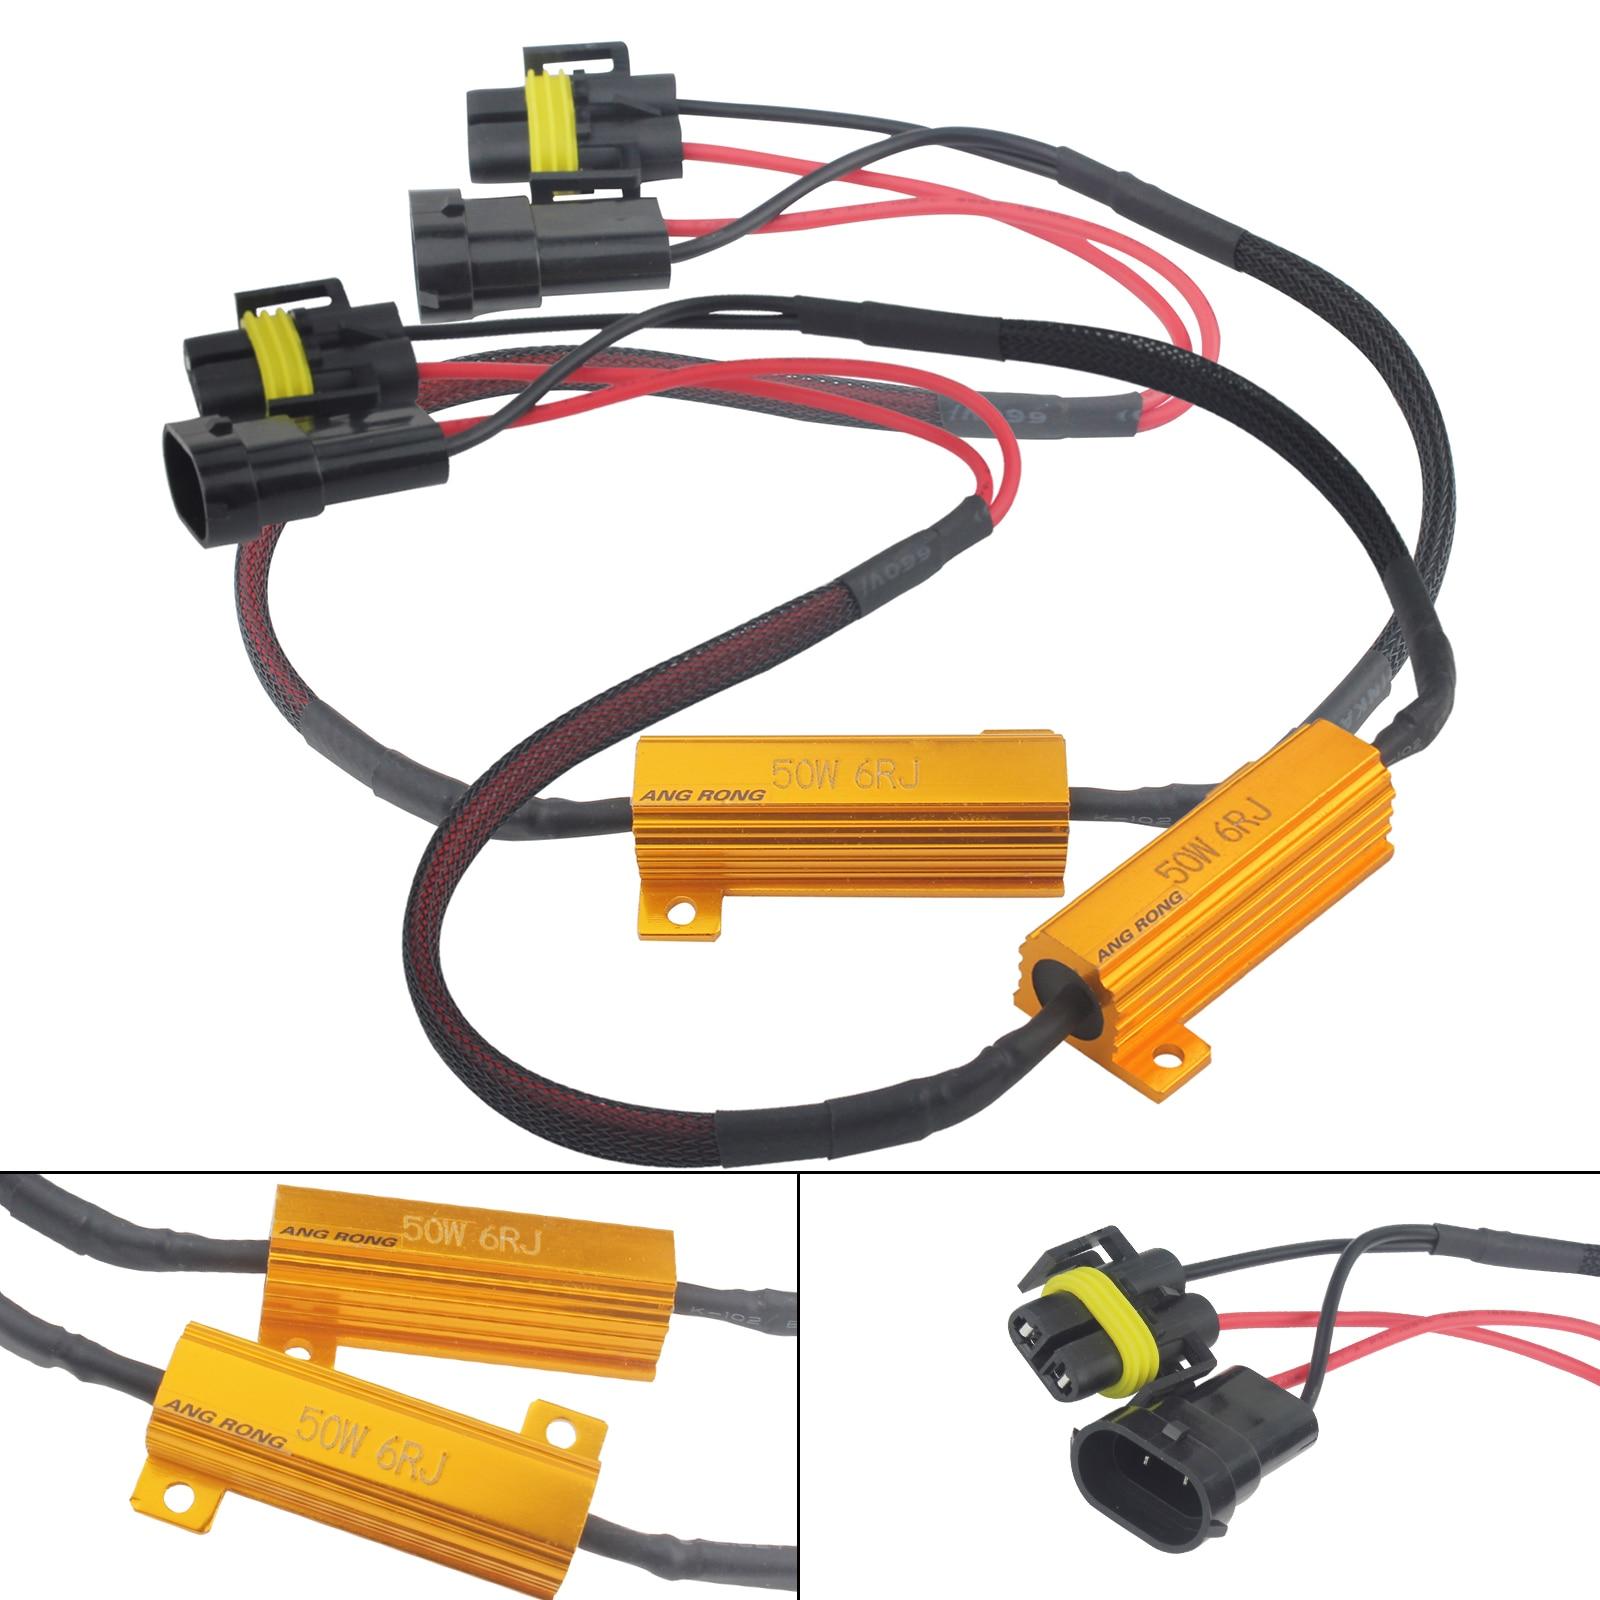 angrong 2pcs h8 h11 led headlight drl fog light load resistors wiring harness canbus [ 1600 x 1600 Pixel ]